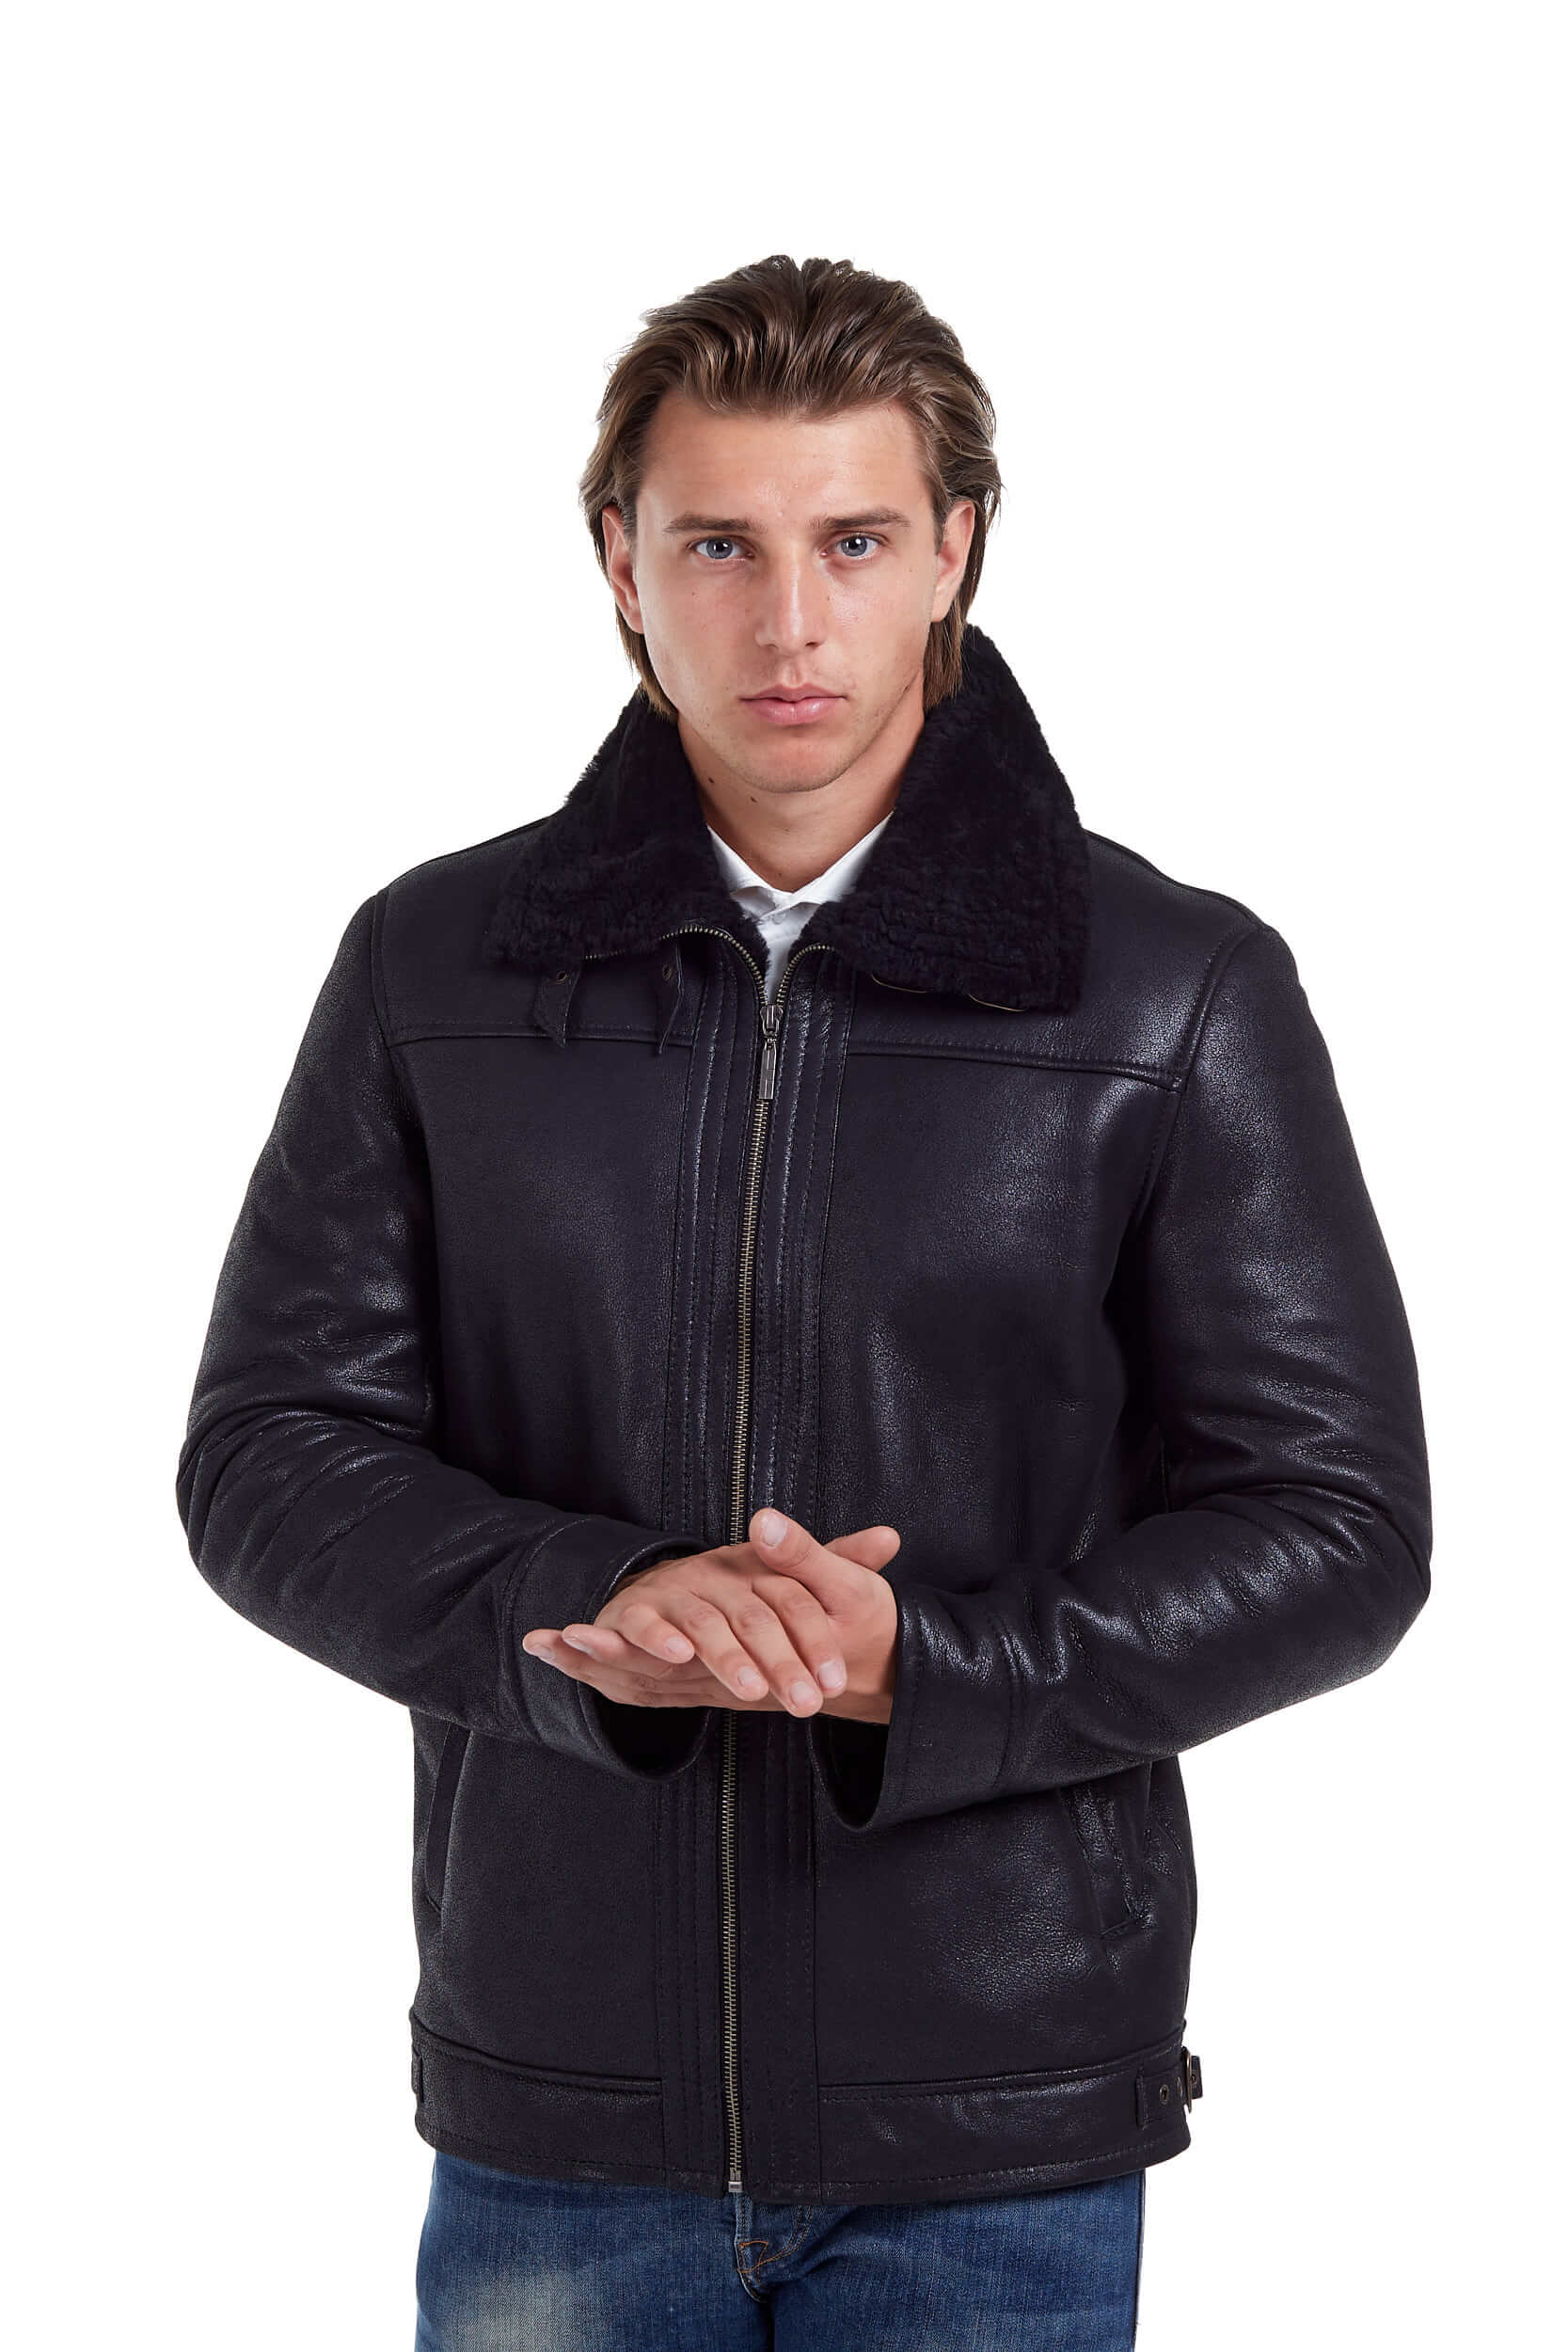 haina de blana neagra pentru barbati